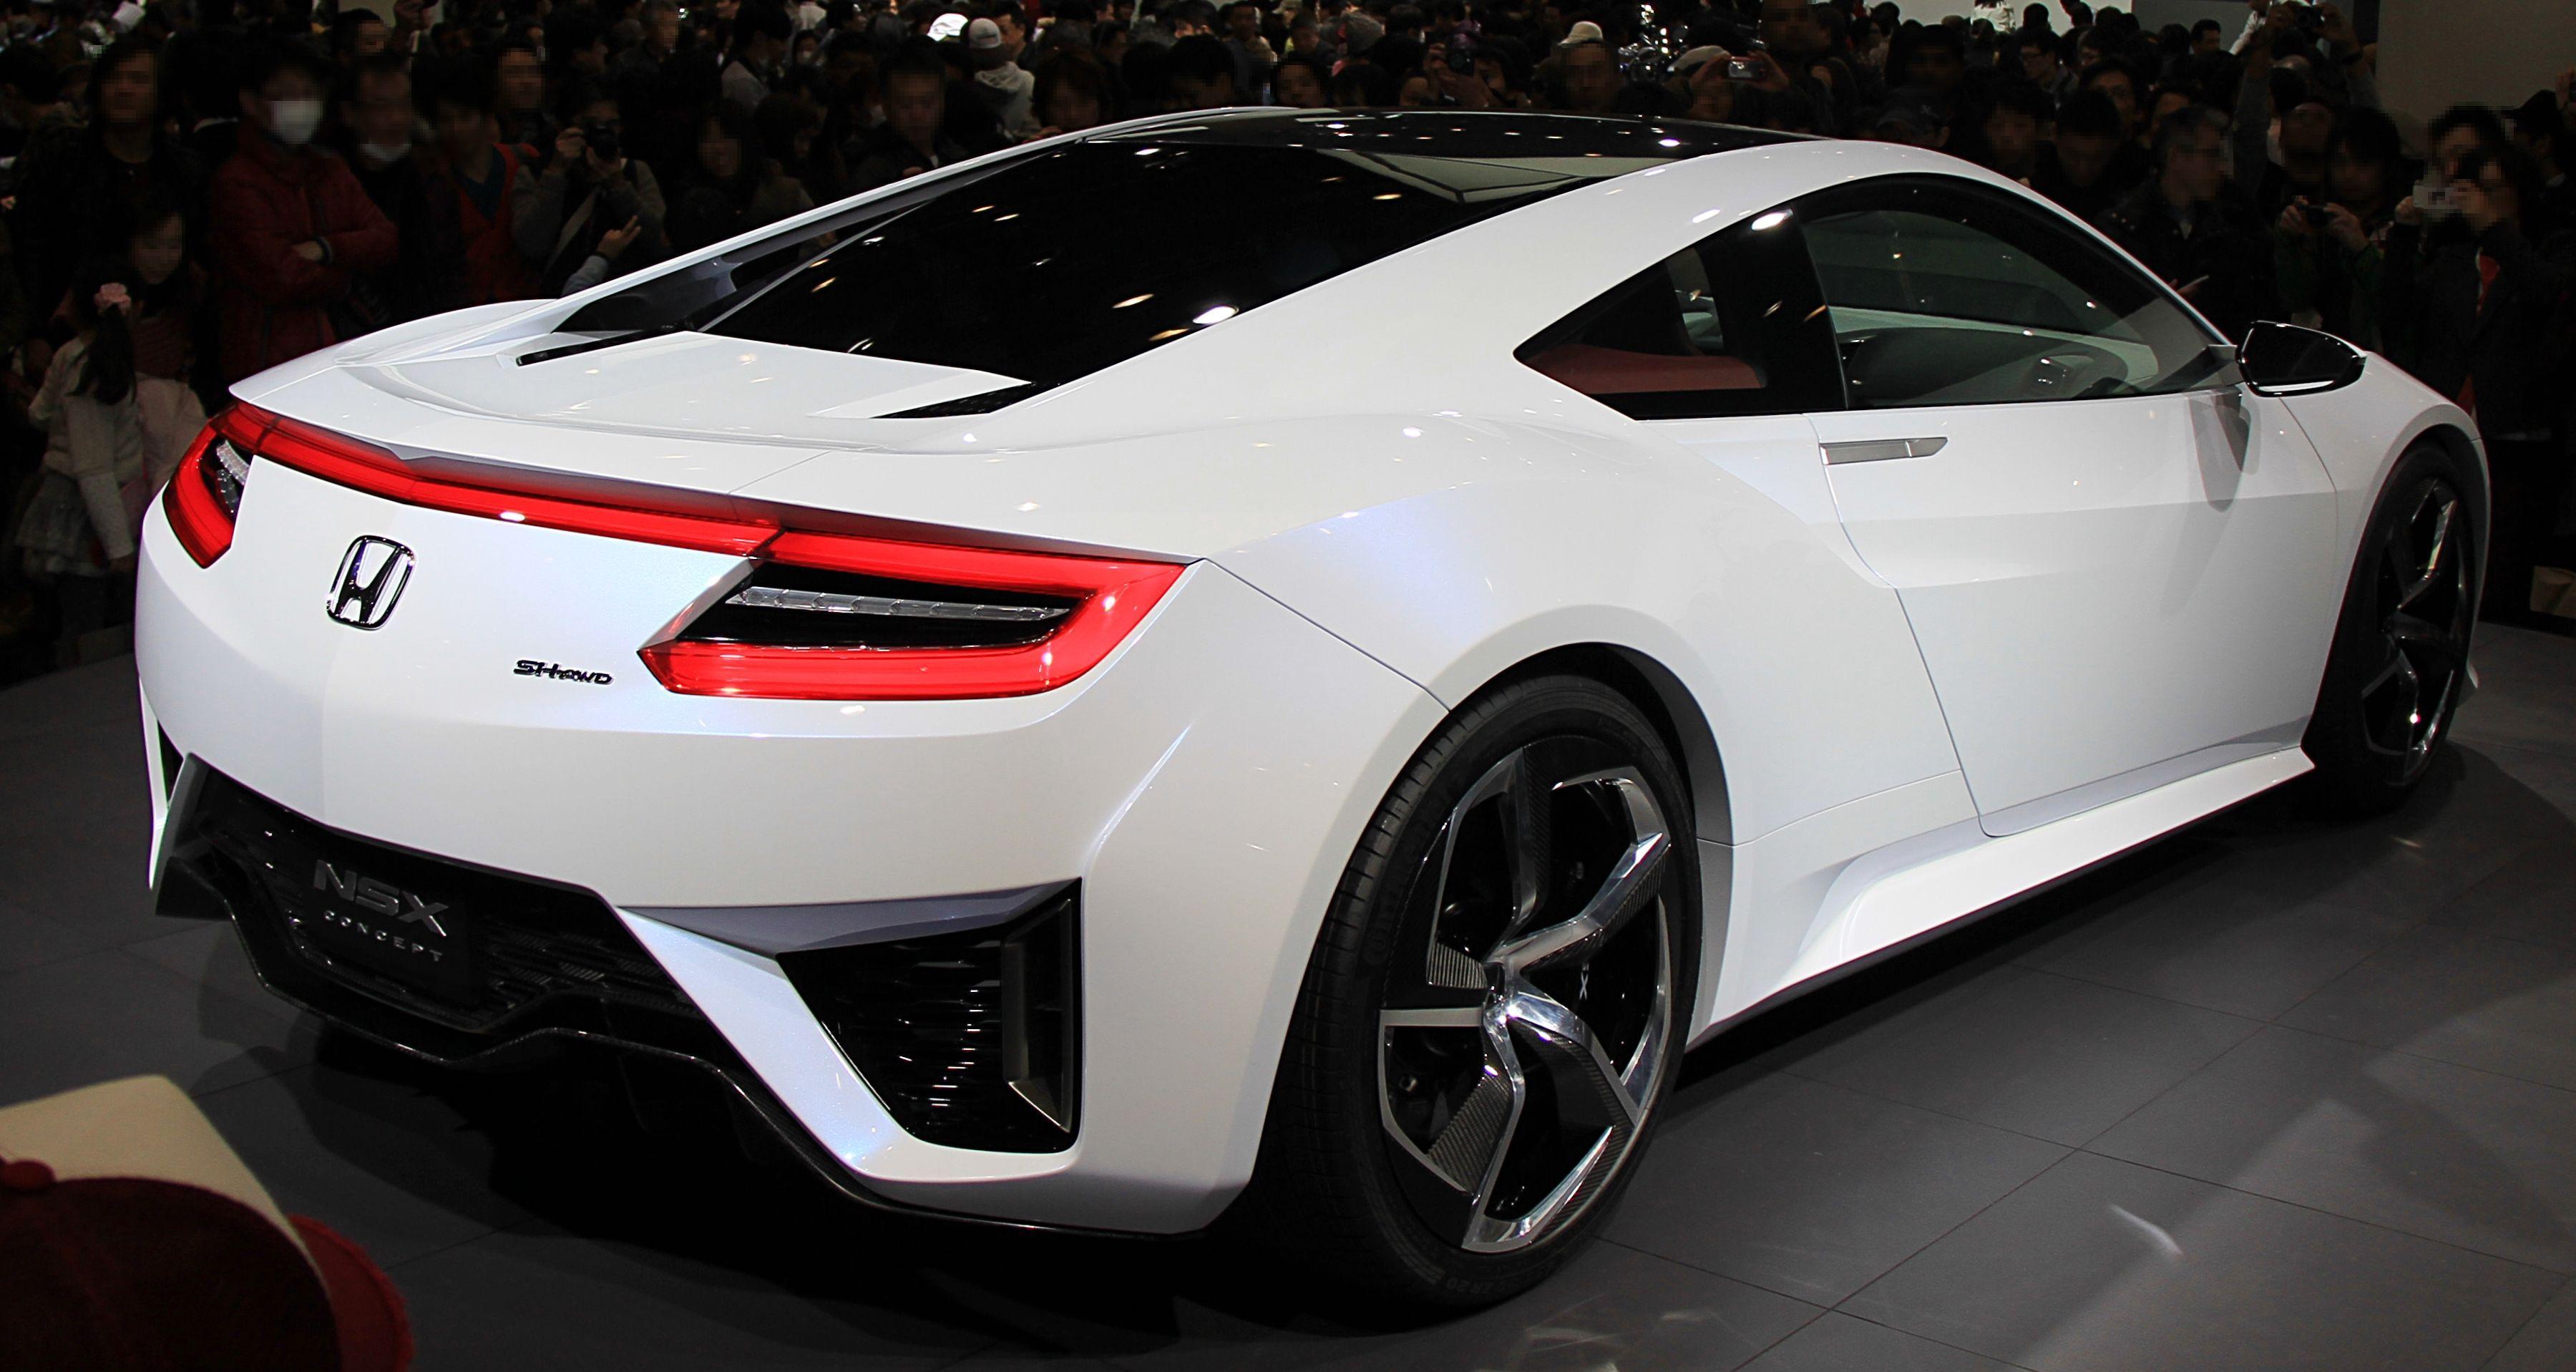 Exceptional Honda NXC Concept 2013